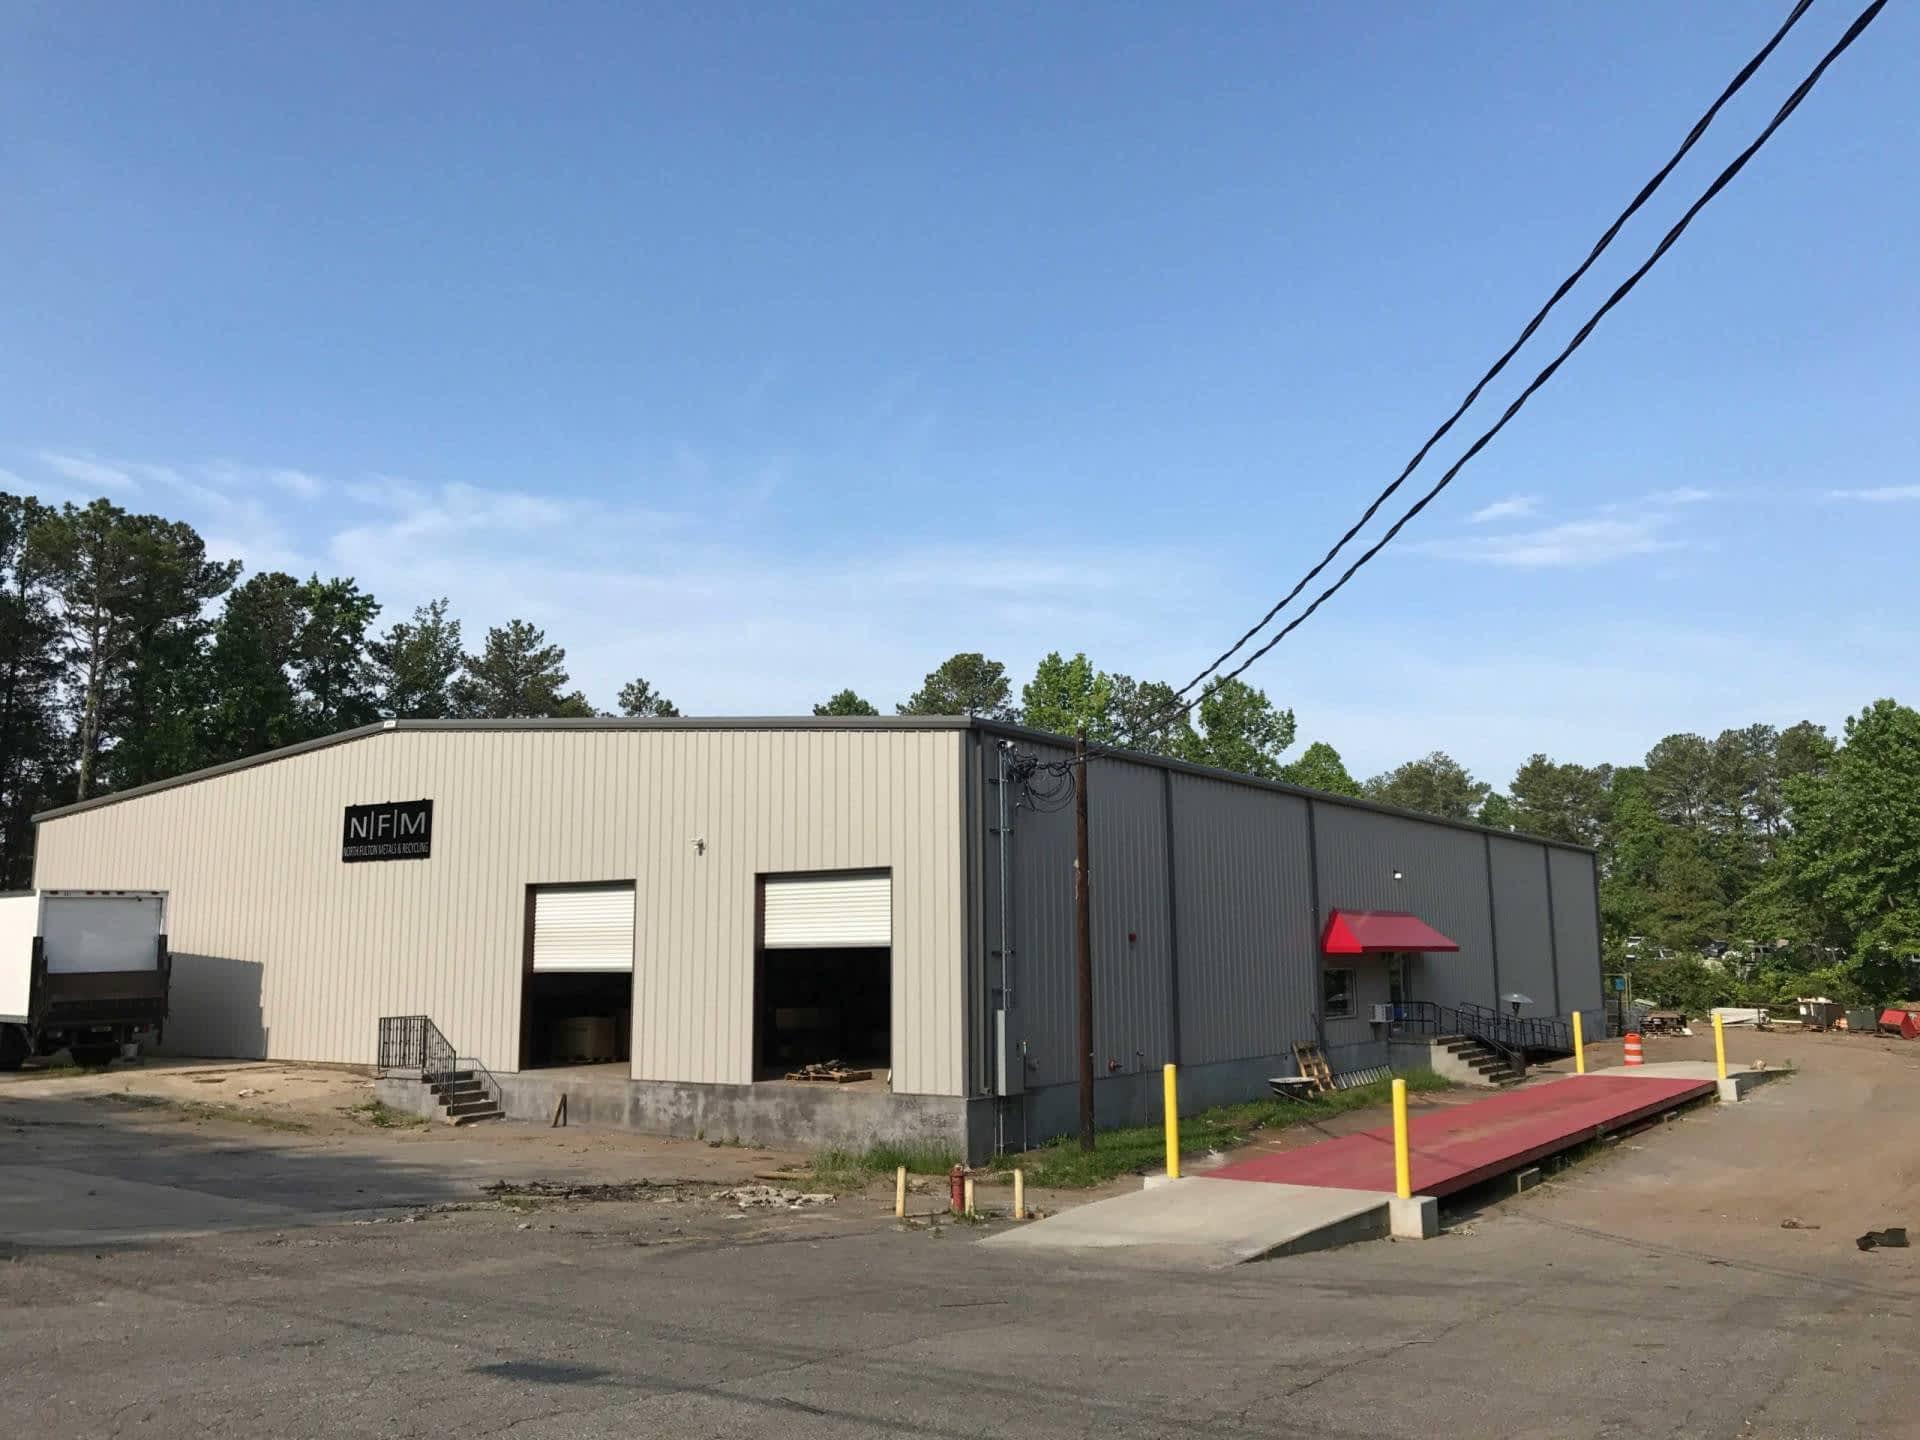 North Fulton Metals - Industrial Sale - 11460 N Fulton Industrial Blvd, Alpharetta, GA